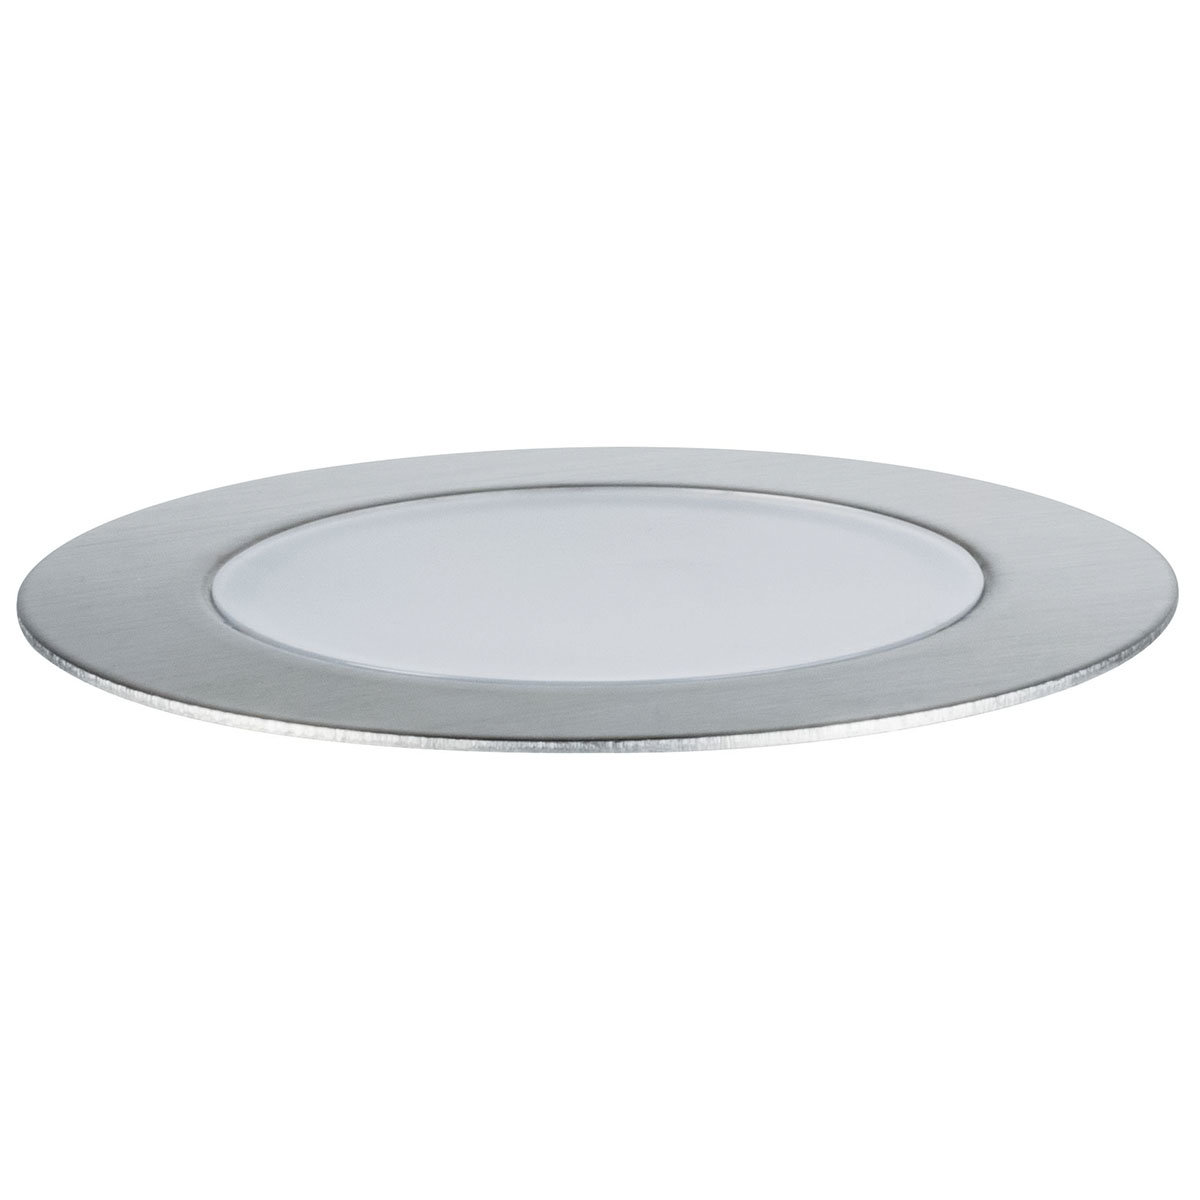 LED Outdoor Plug & Shine Floor Basis-Set, 3000K 3x1,3W  24V IP67, silber   #5